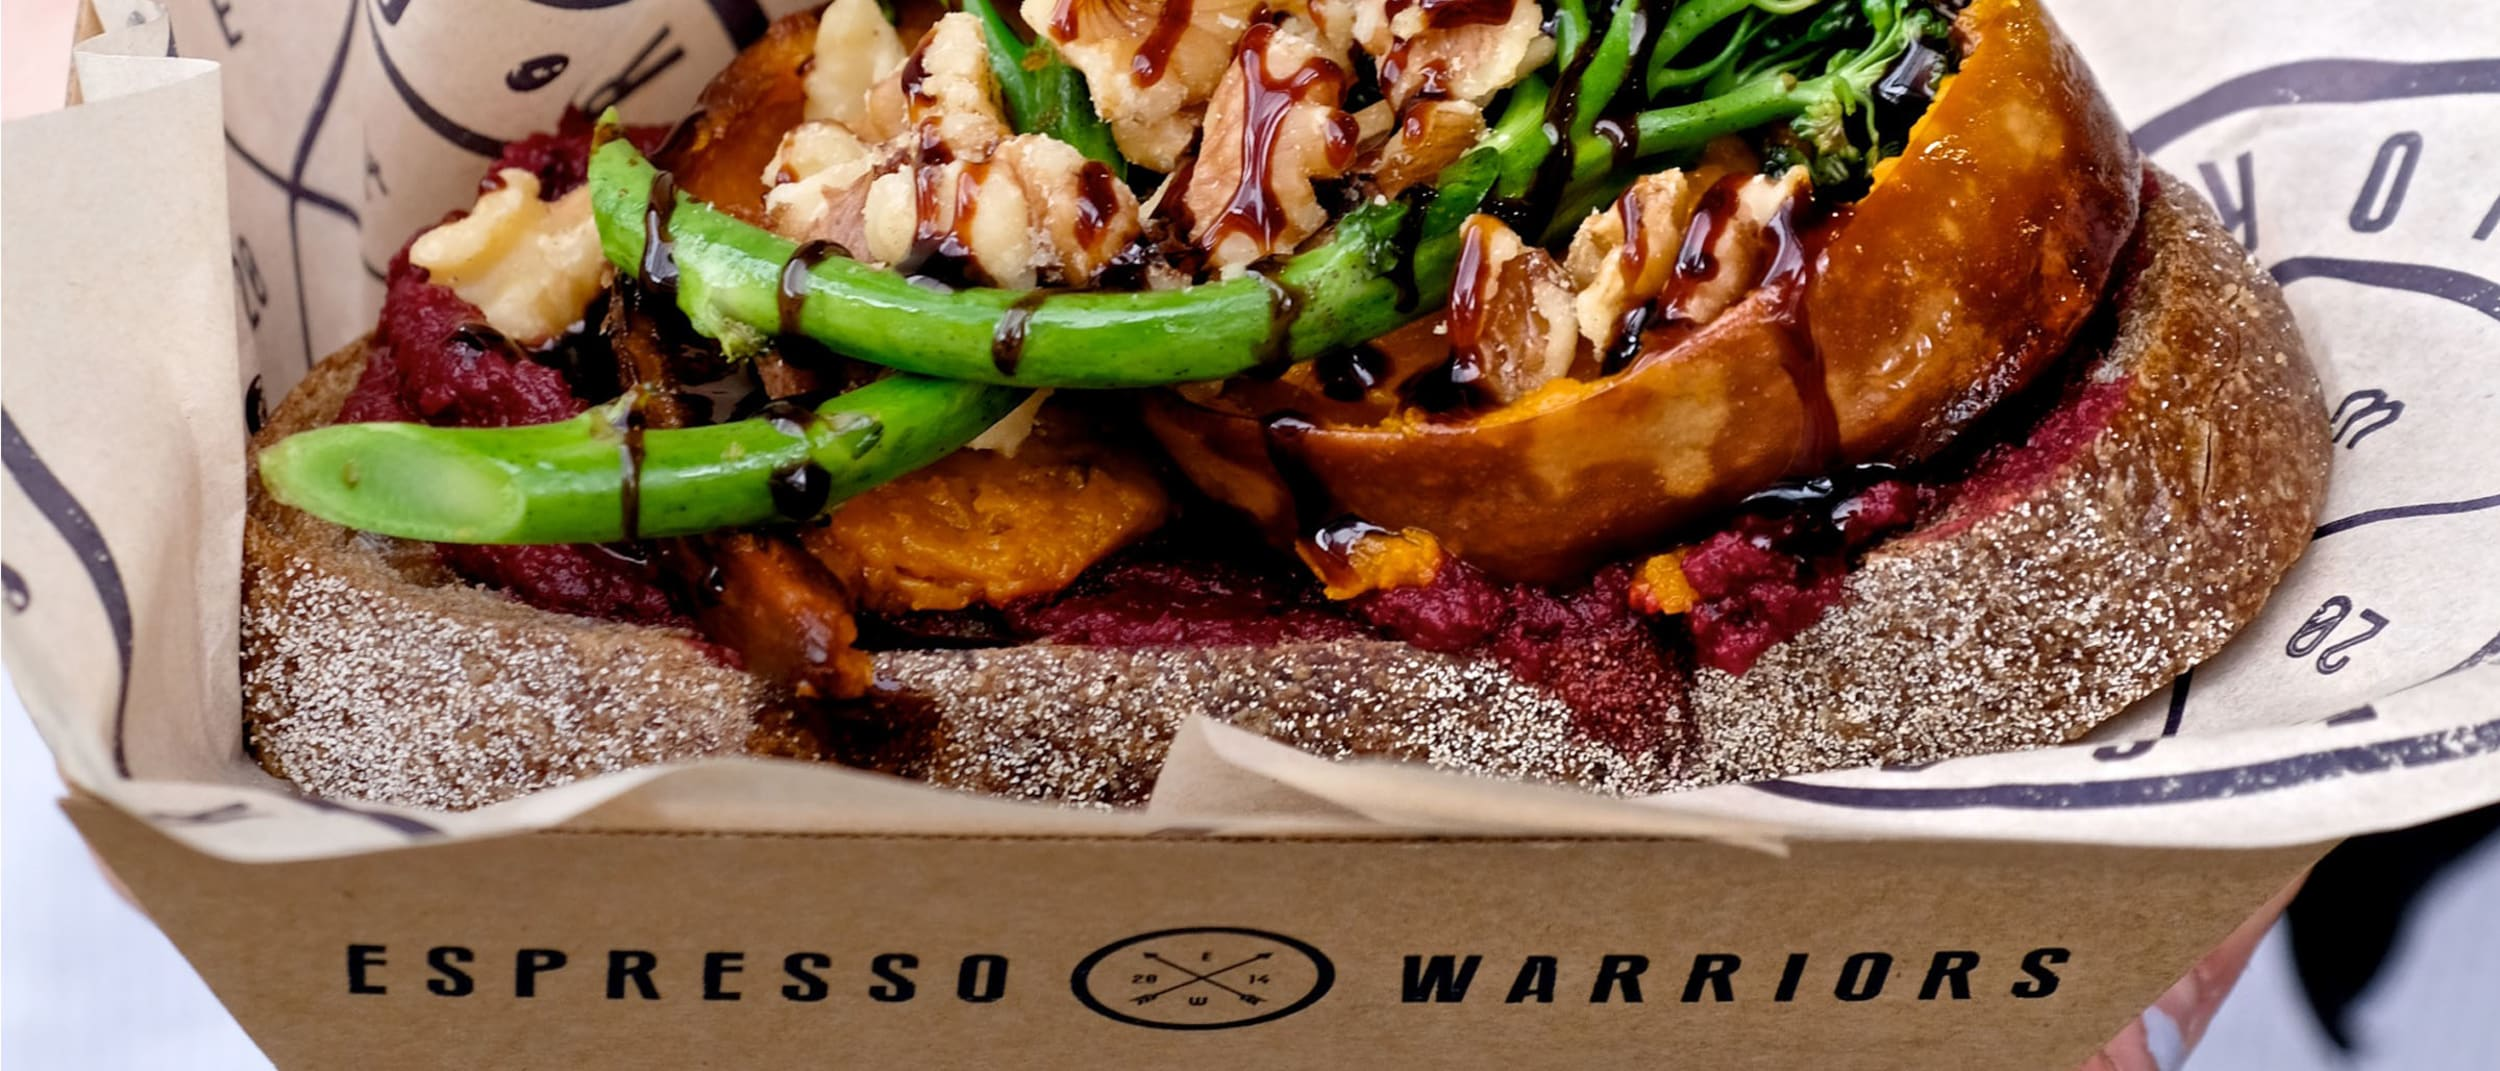 Espresso Warriors launch new seasonal menu